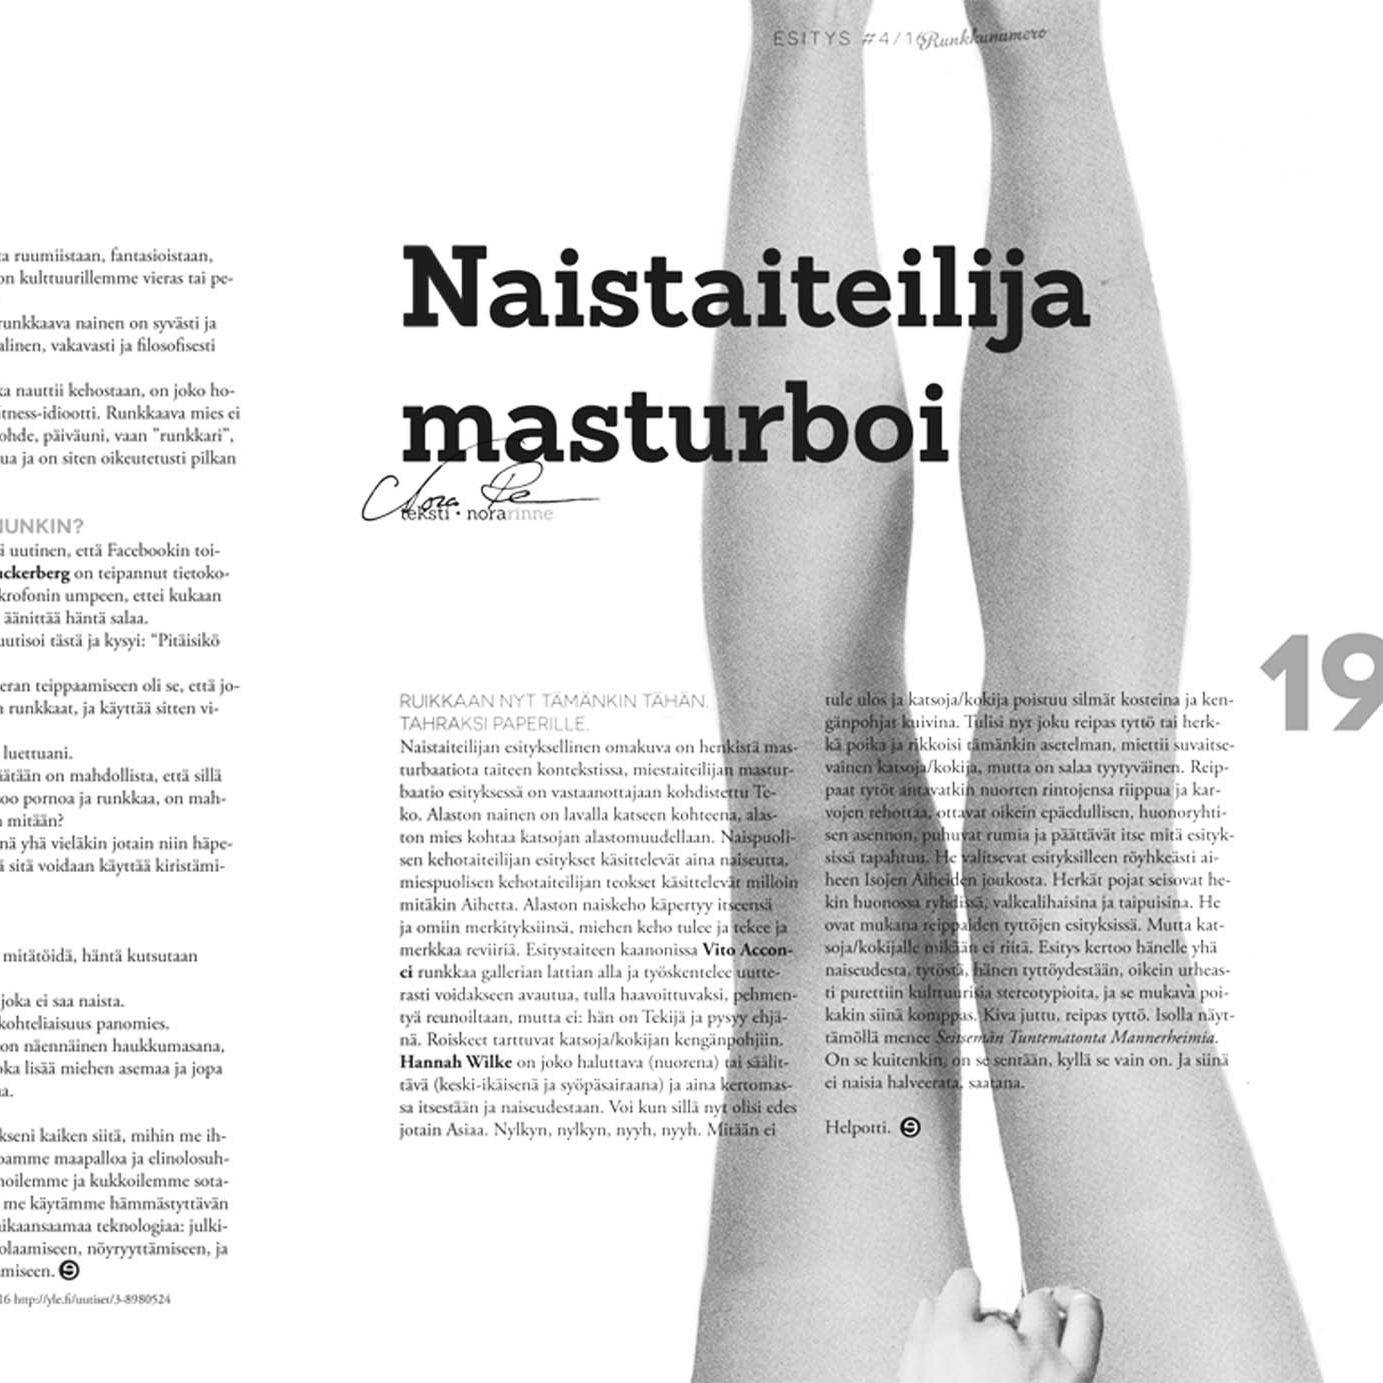 Naistaiteilija masturboi_Esitys#4_2016.jpg